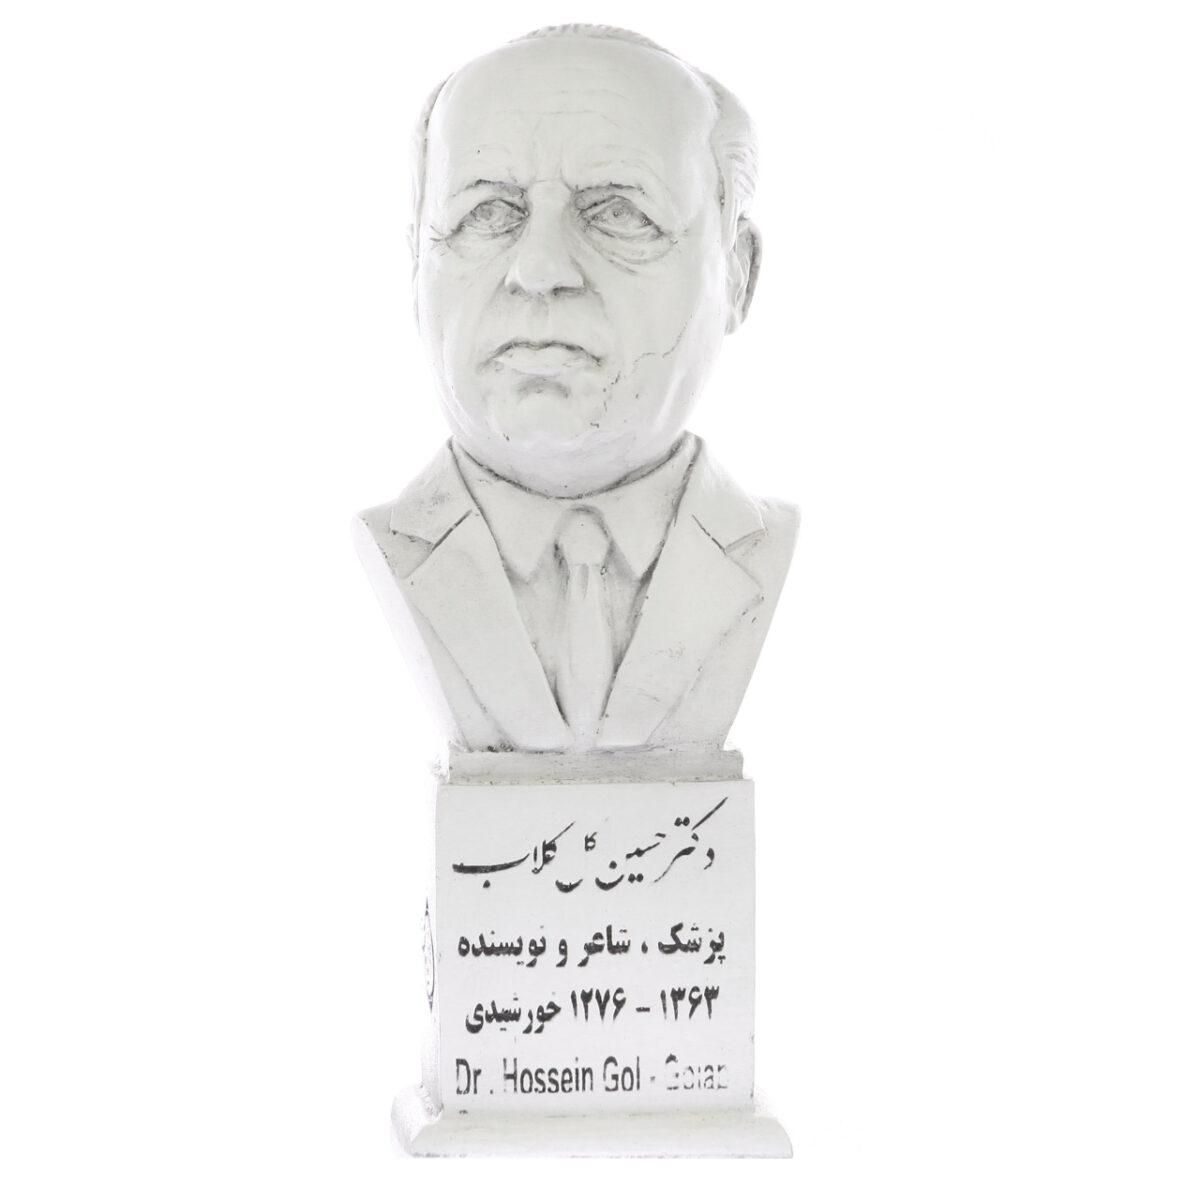 dr hossein gol golab s 1200x1200 - سردیس دکتر حسین گل گلاب